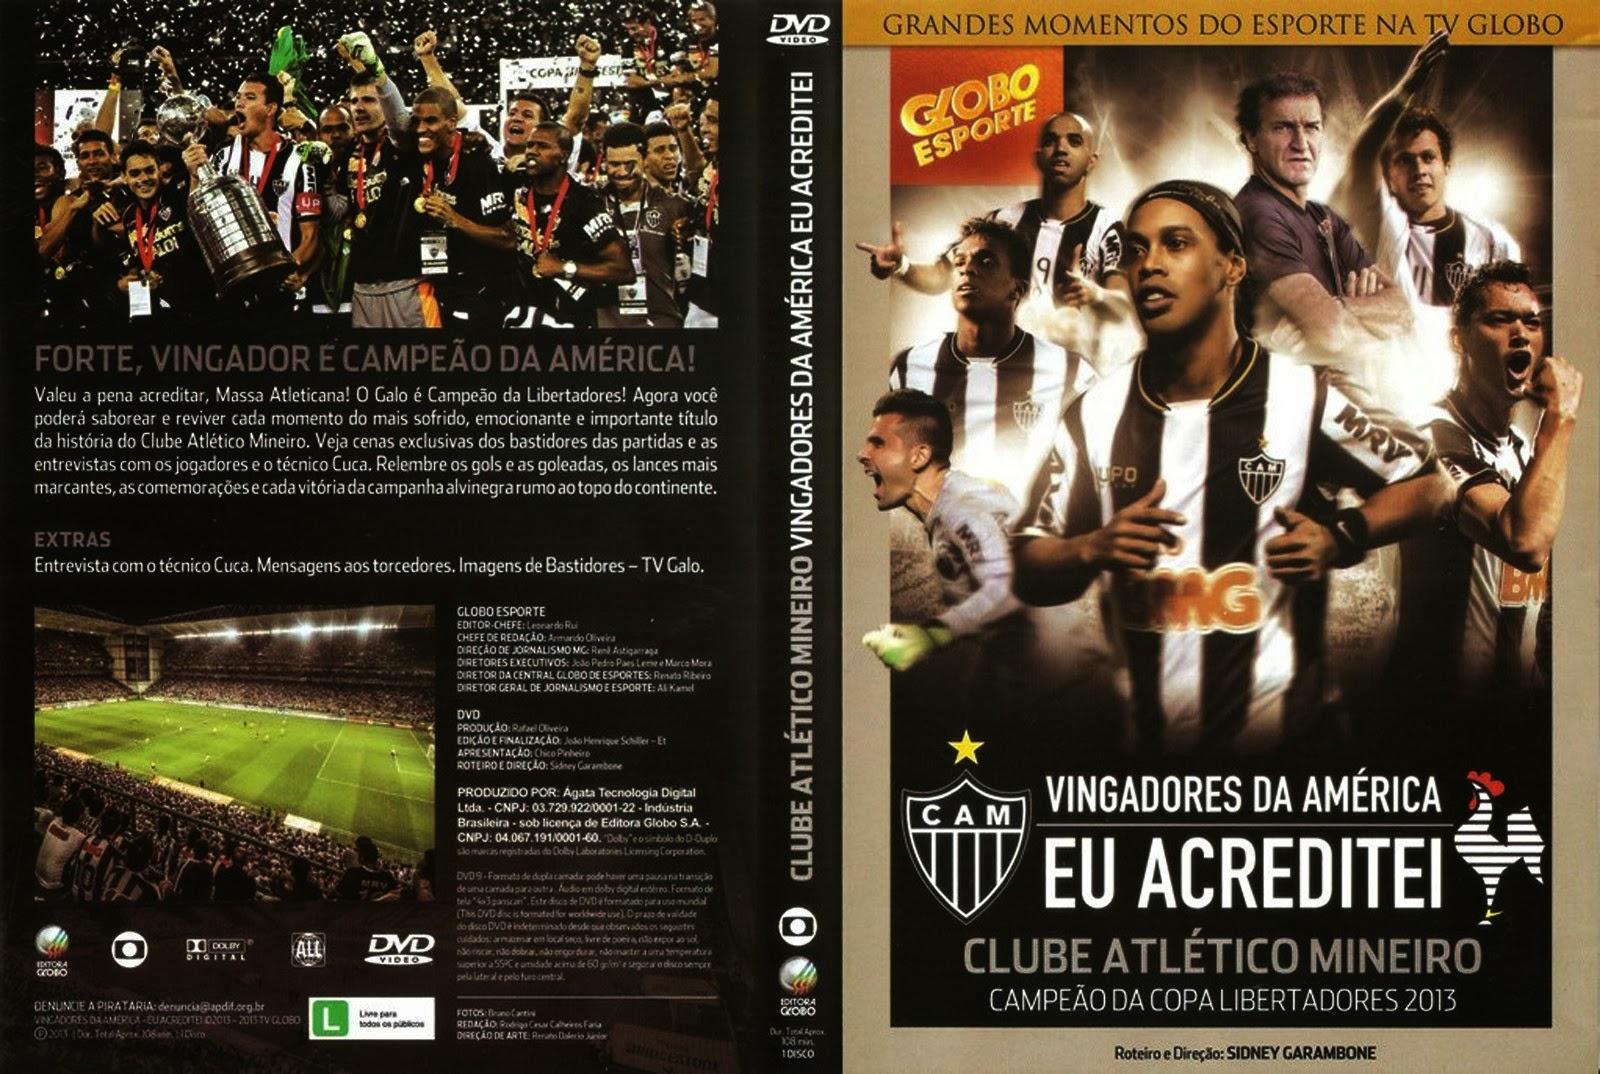 Vingadores da América Eu Acreditei DVDRip XviD Nacional capa